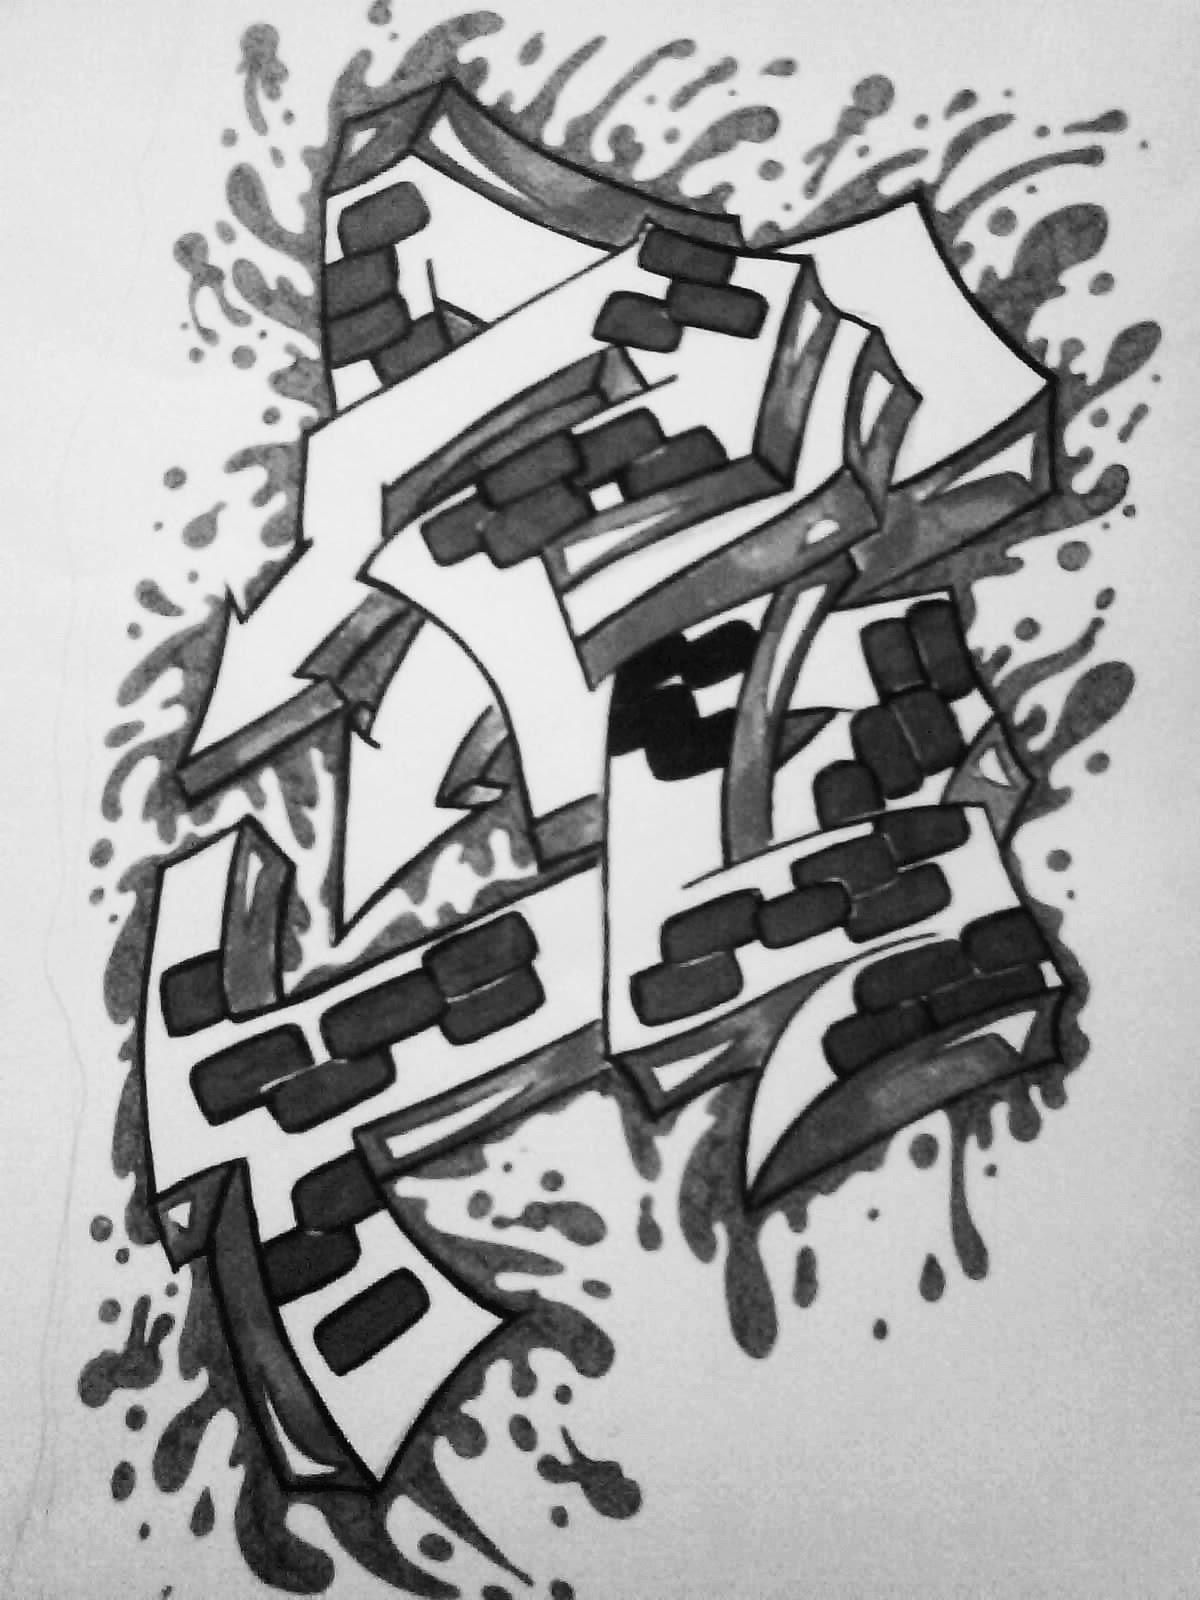 Graffiti Creator Styles: Graffiti wallpaper black and white